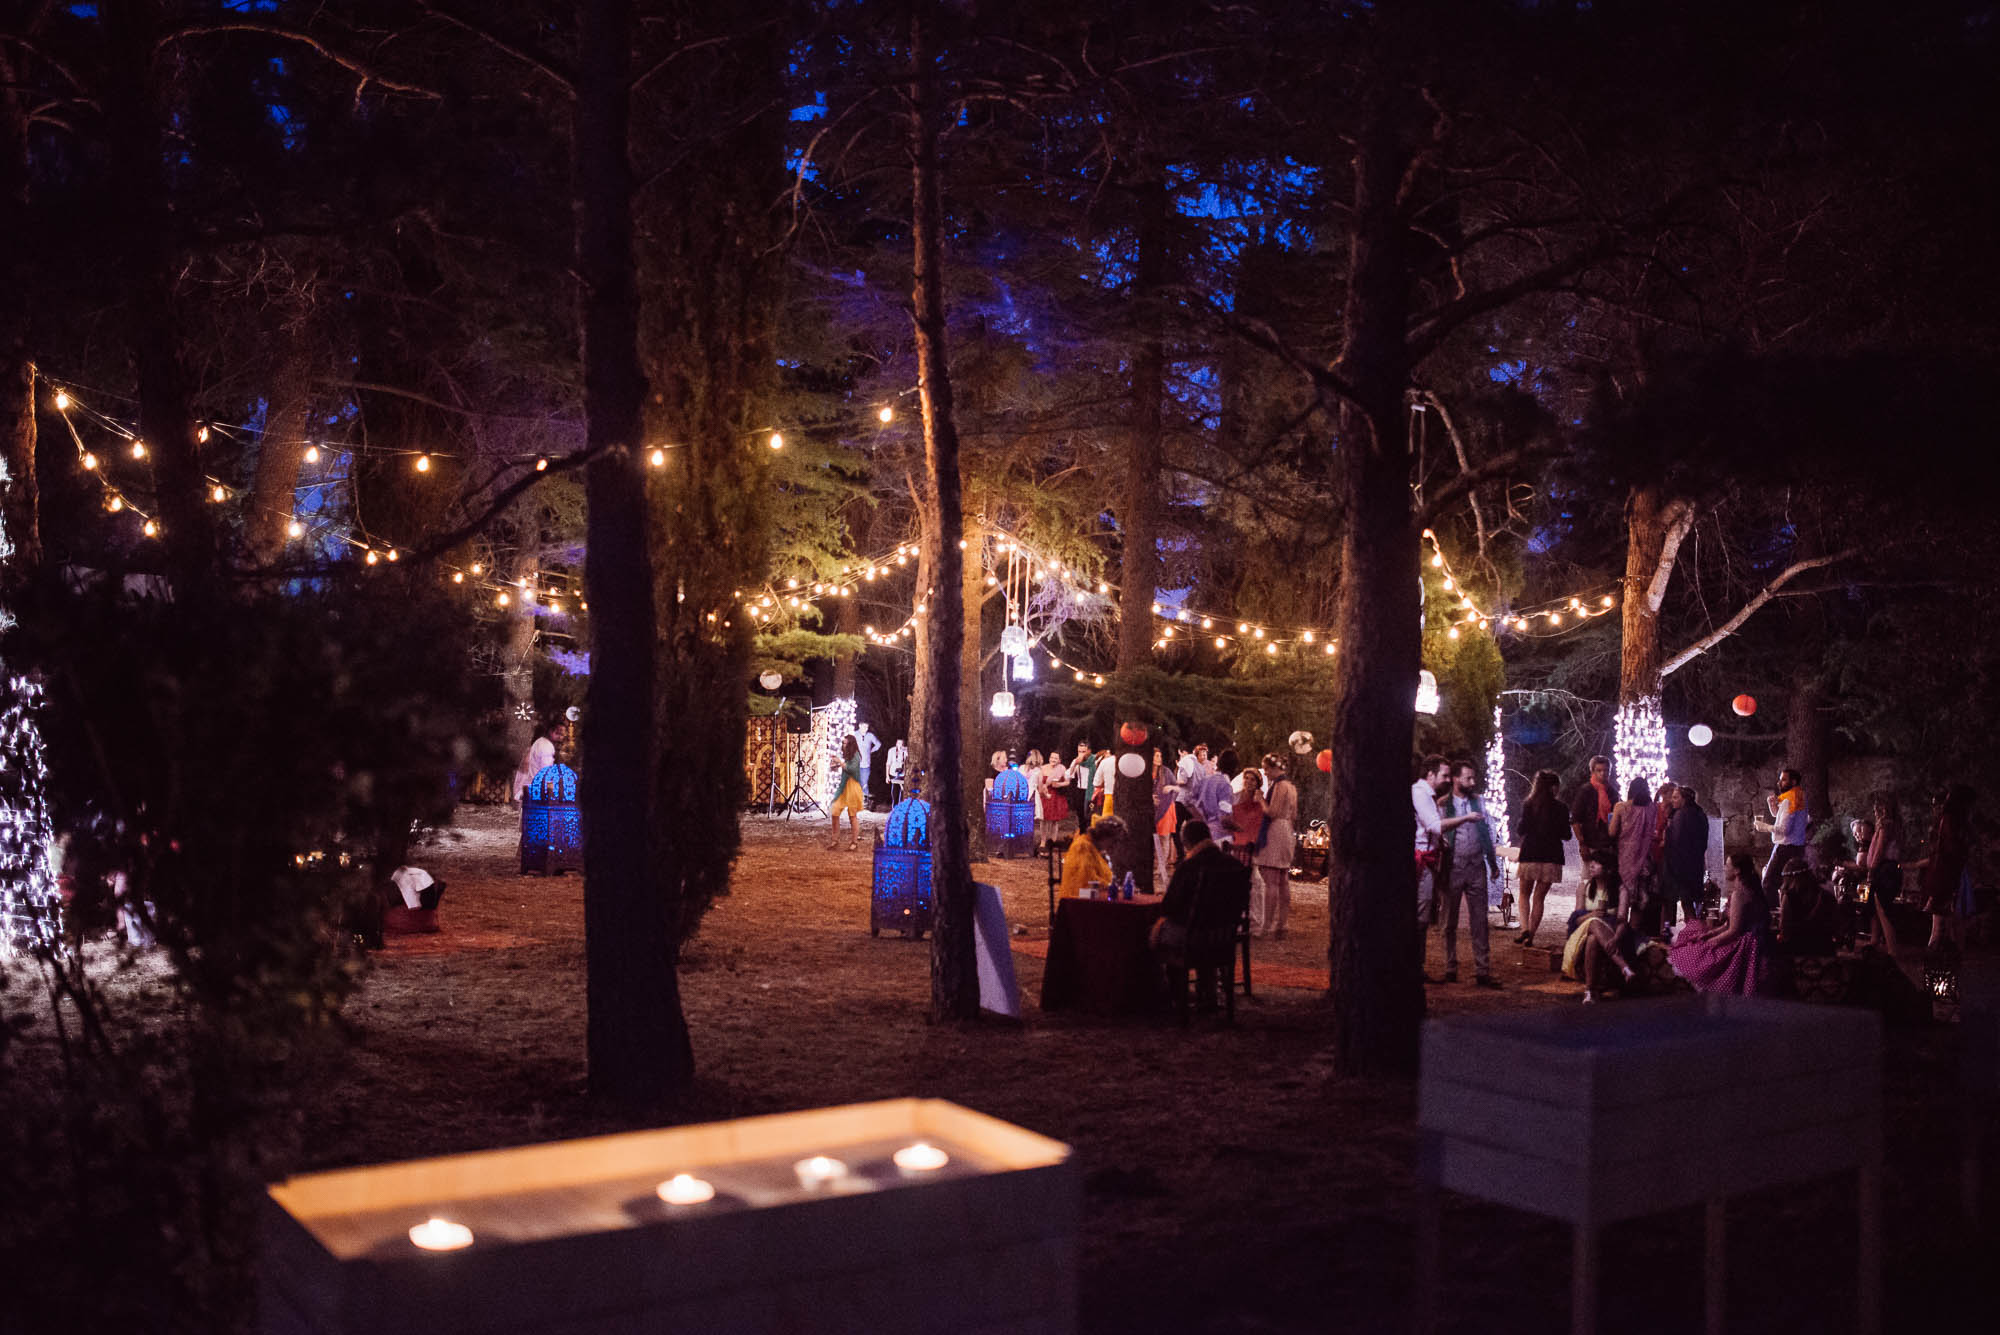 La fiesta con luces  por la noche